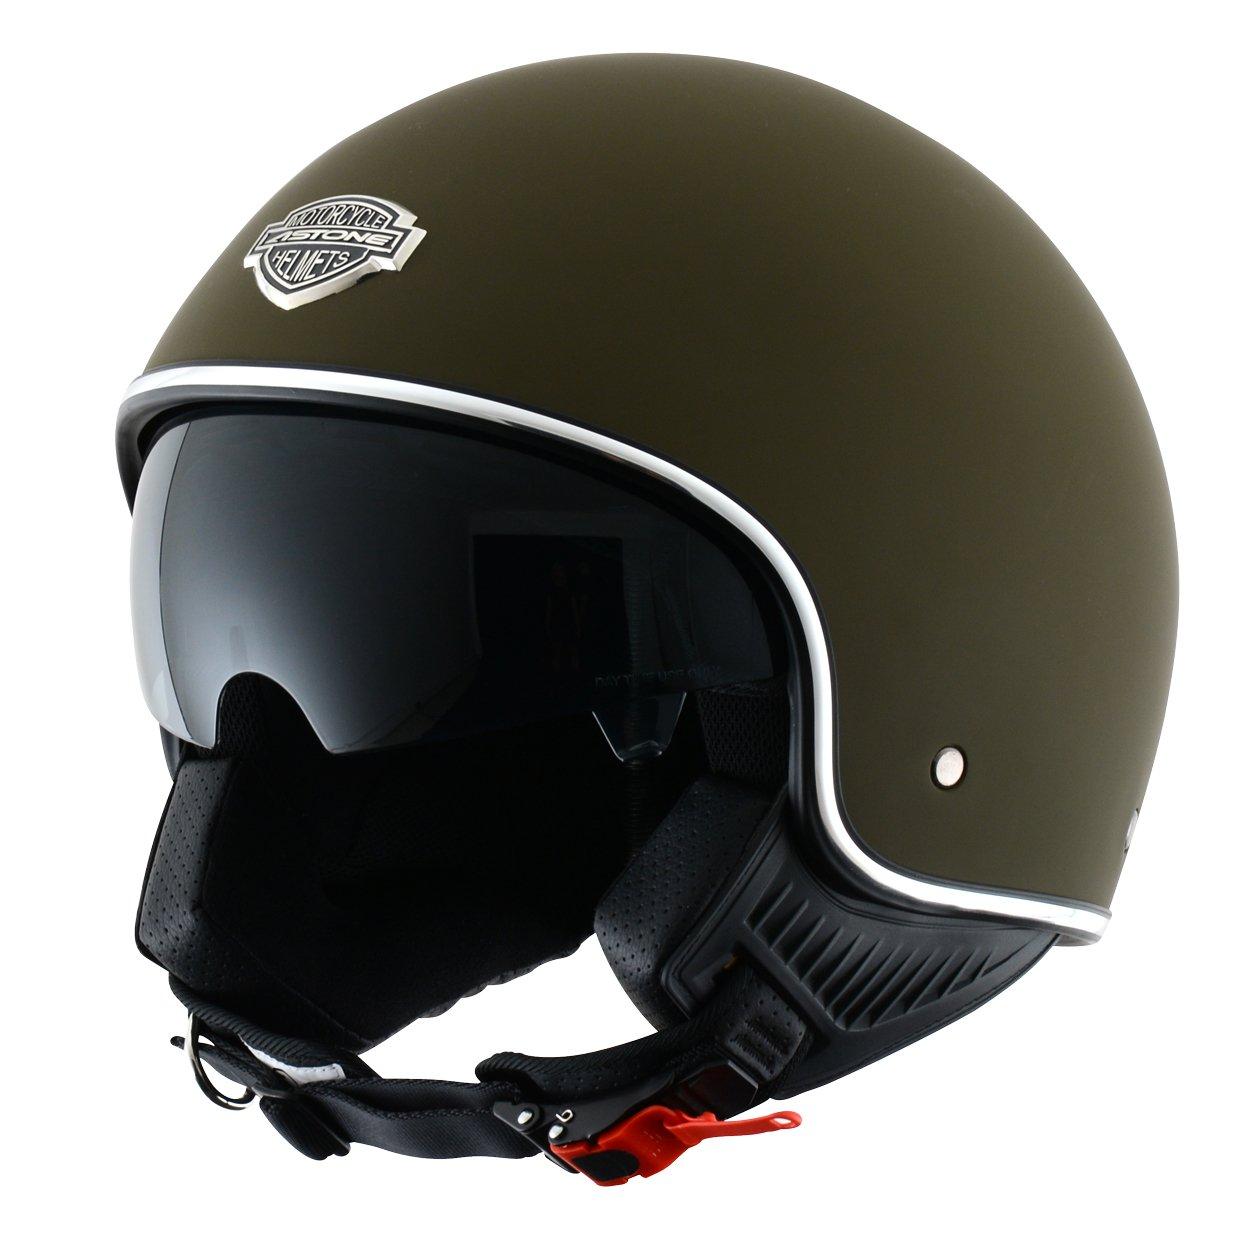 Astone Helmets MINI66-MBKXL Casque Jet, Noir Mat, XL Aixstream Sport Trading